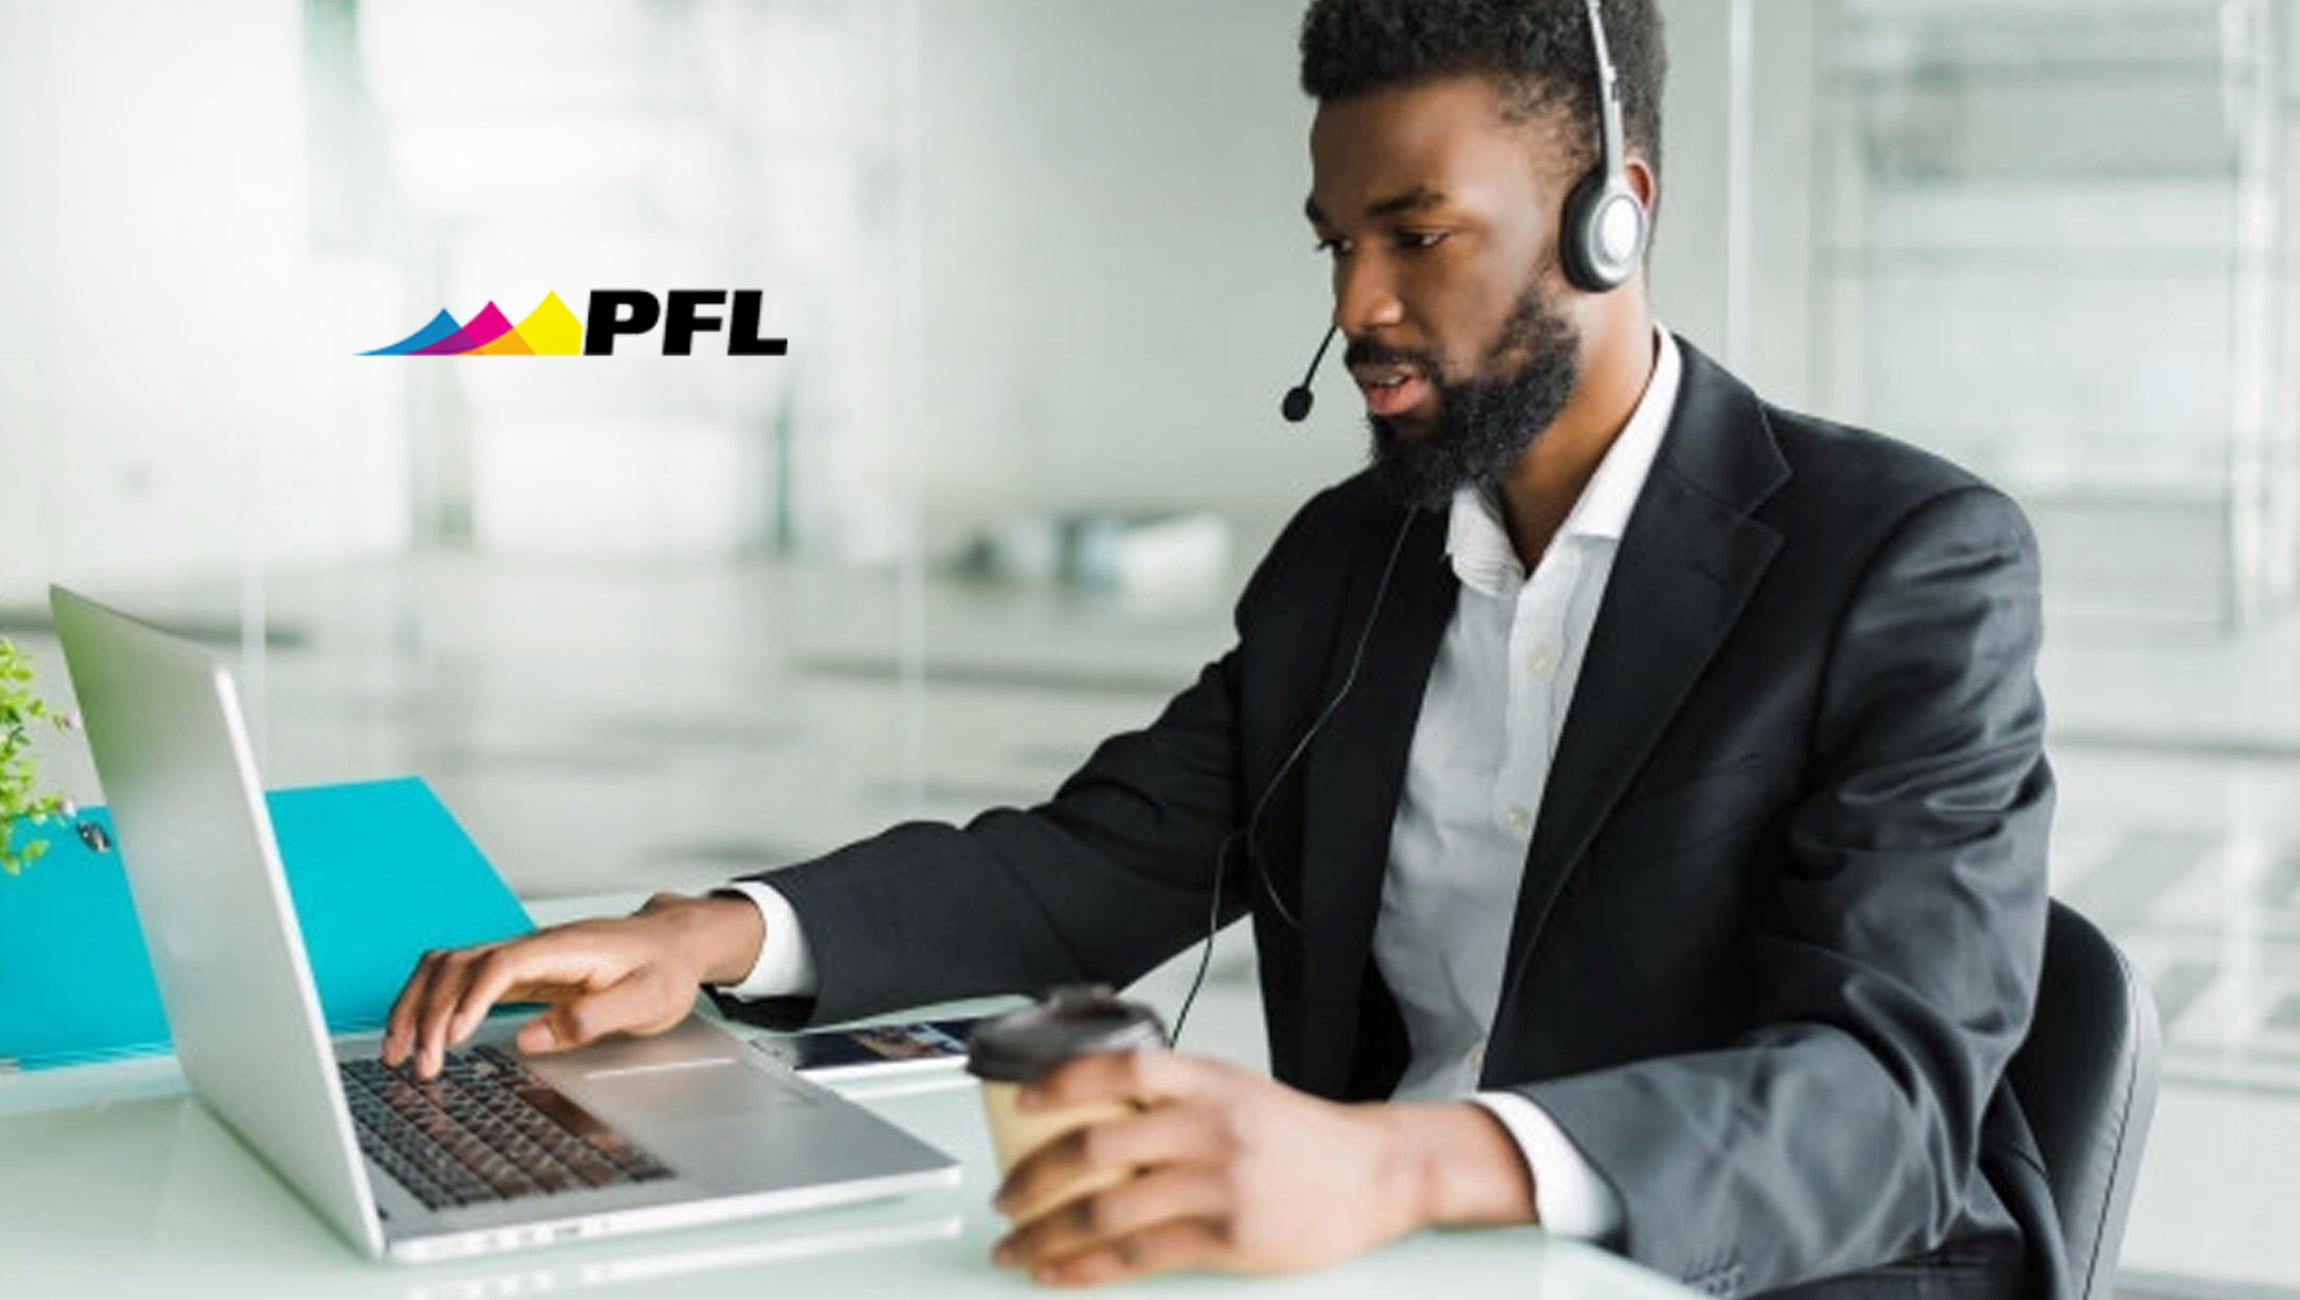 PFL Enhances Tactile Marketing Automation, Command Center Products